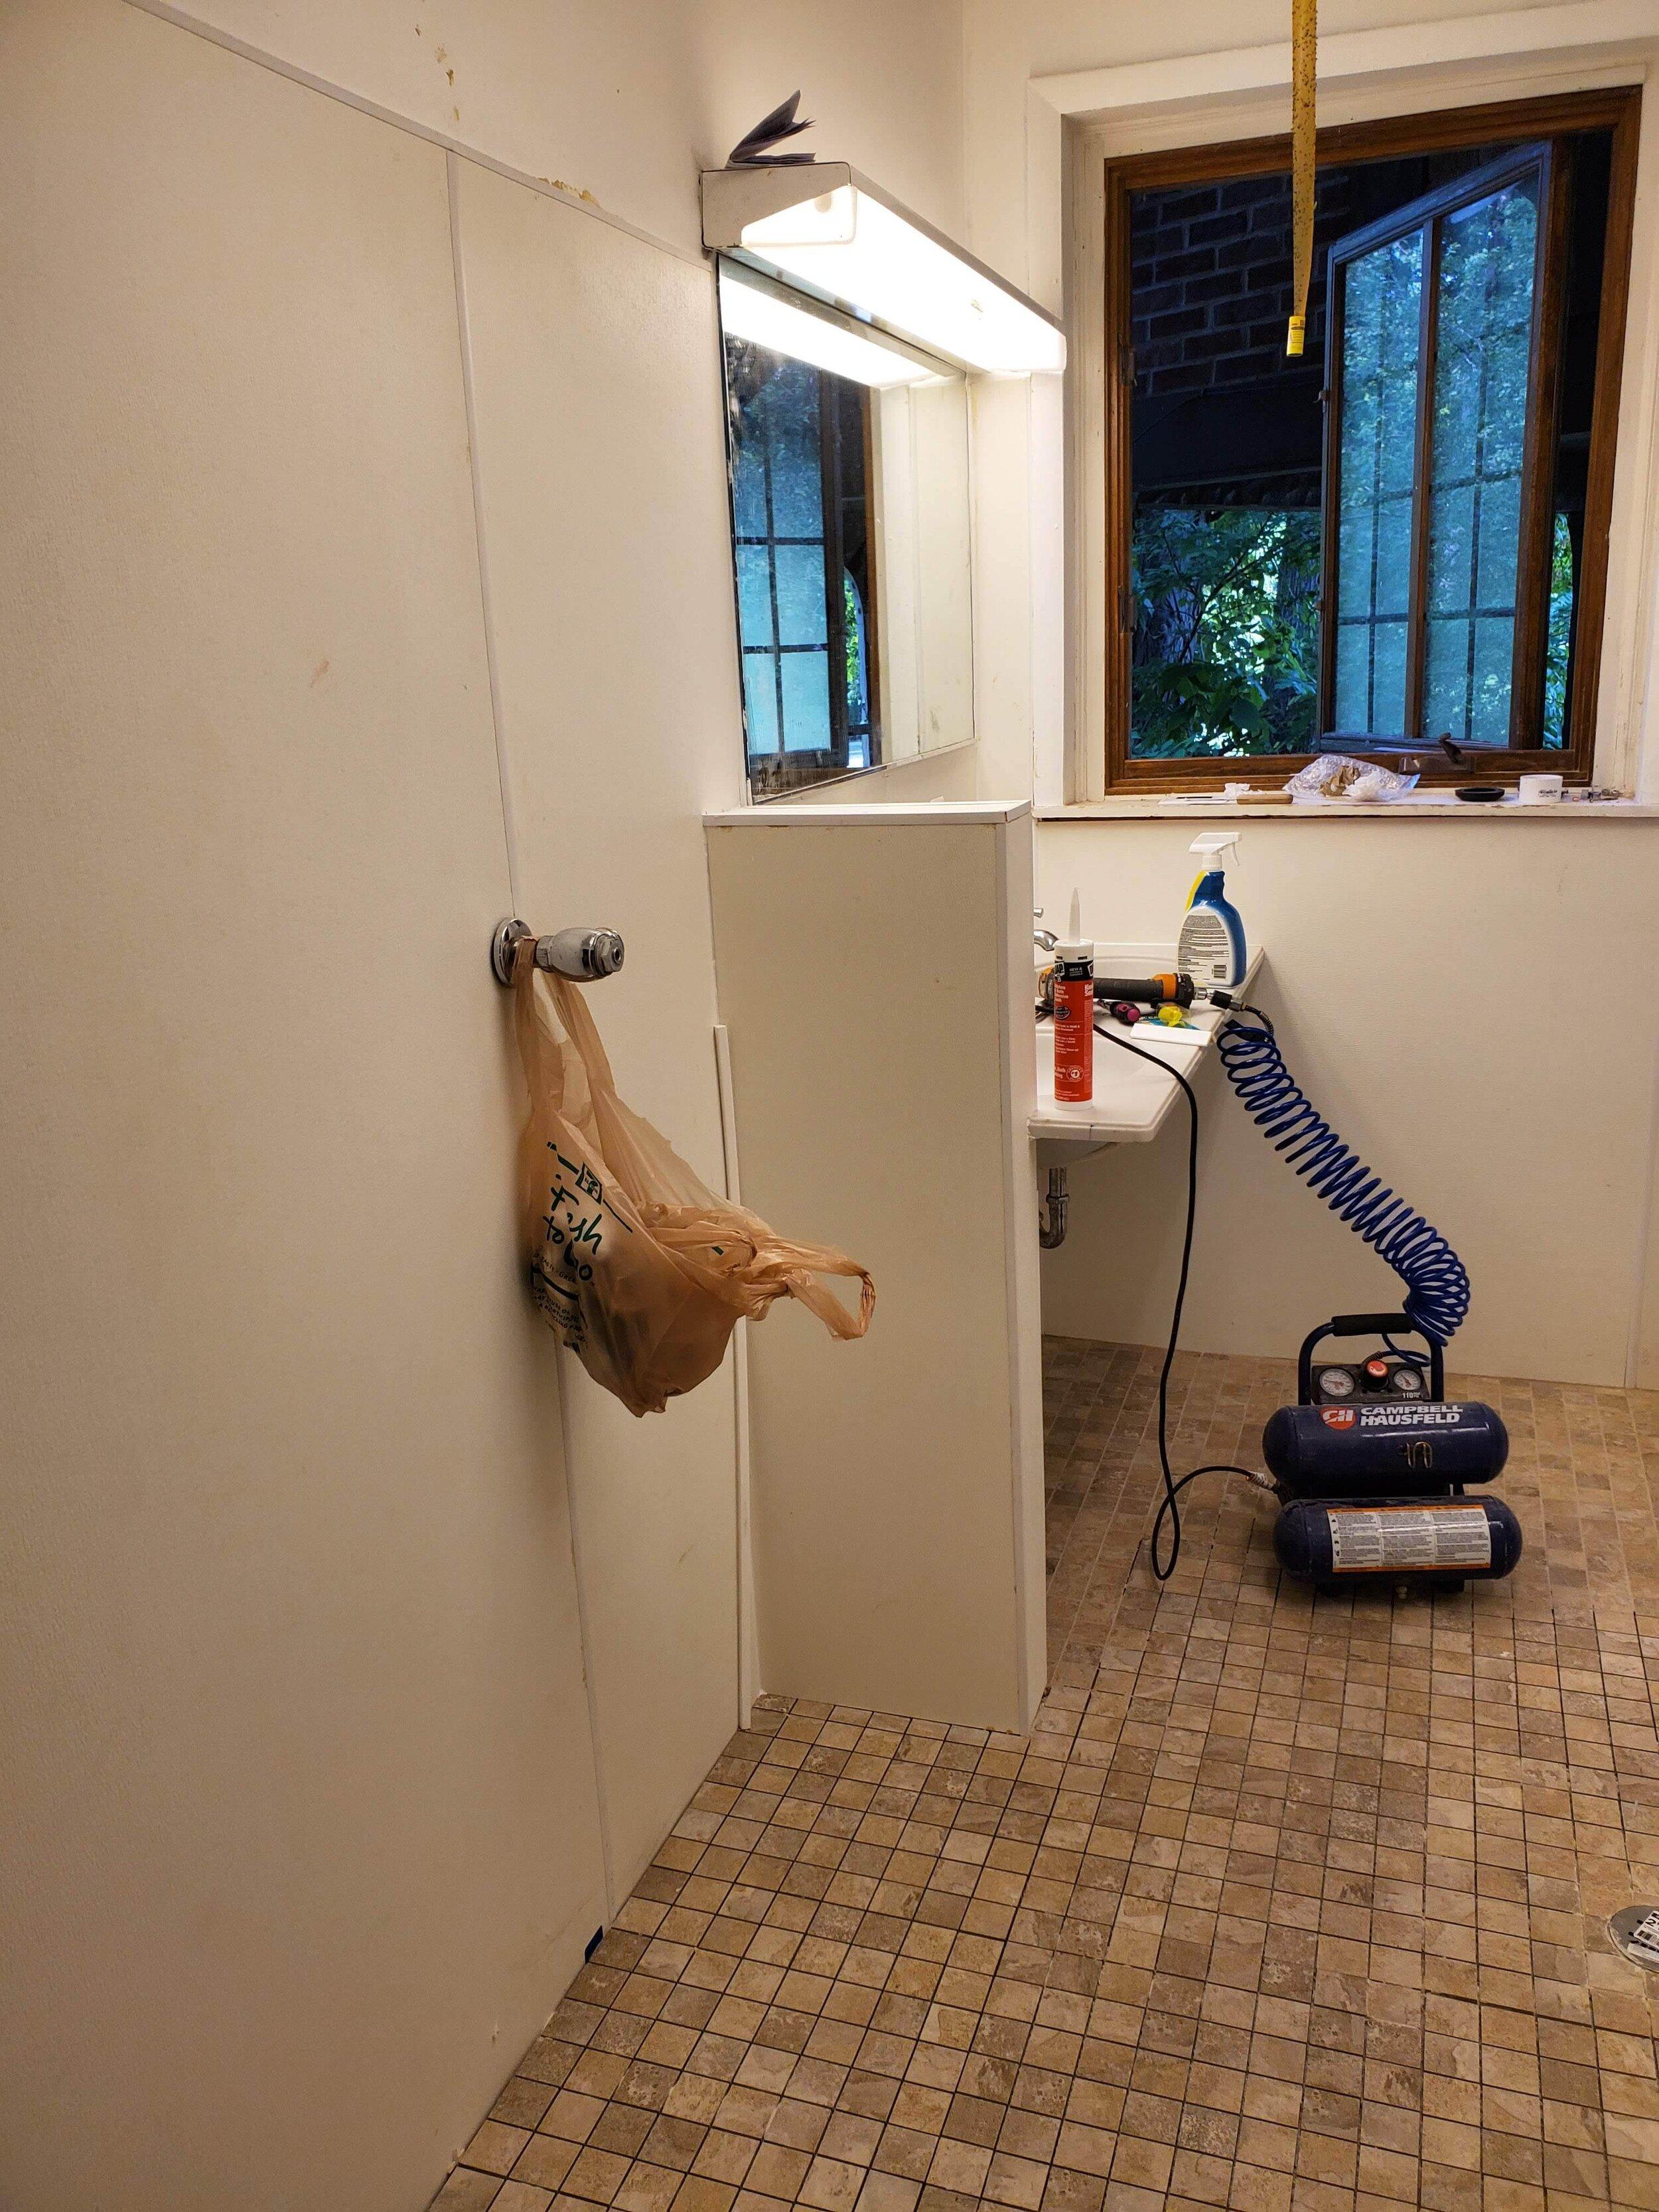 2019 First Floor Bathroom Renovation 20190815_104525.jpg